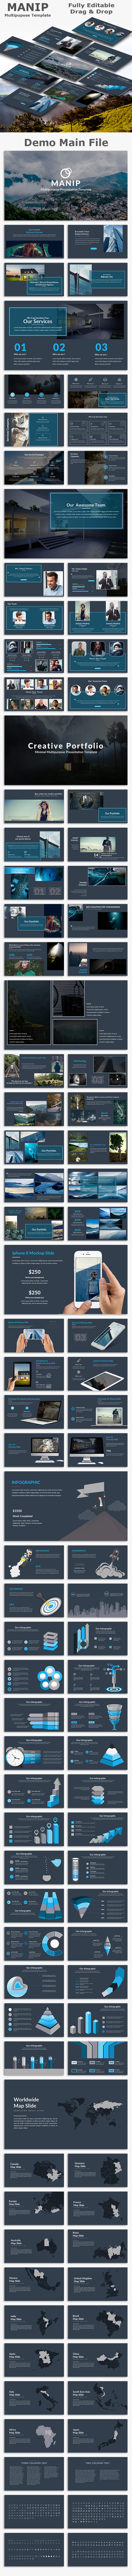 Manip Multipupose Google Slide Template - Google Slides Presentation Templates